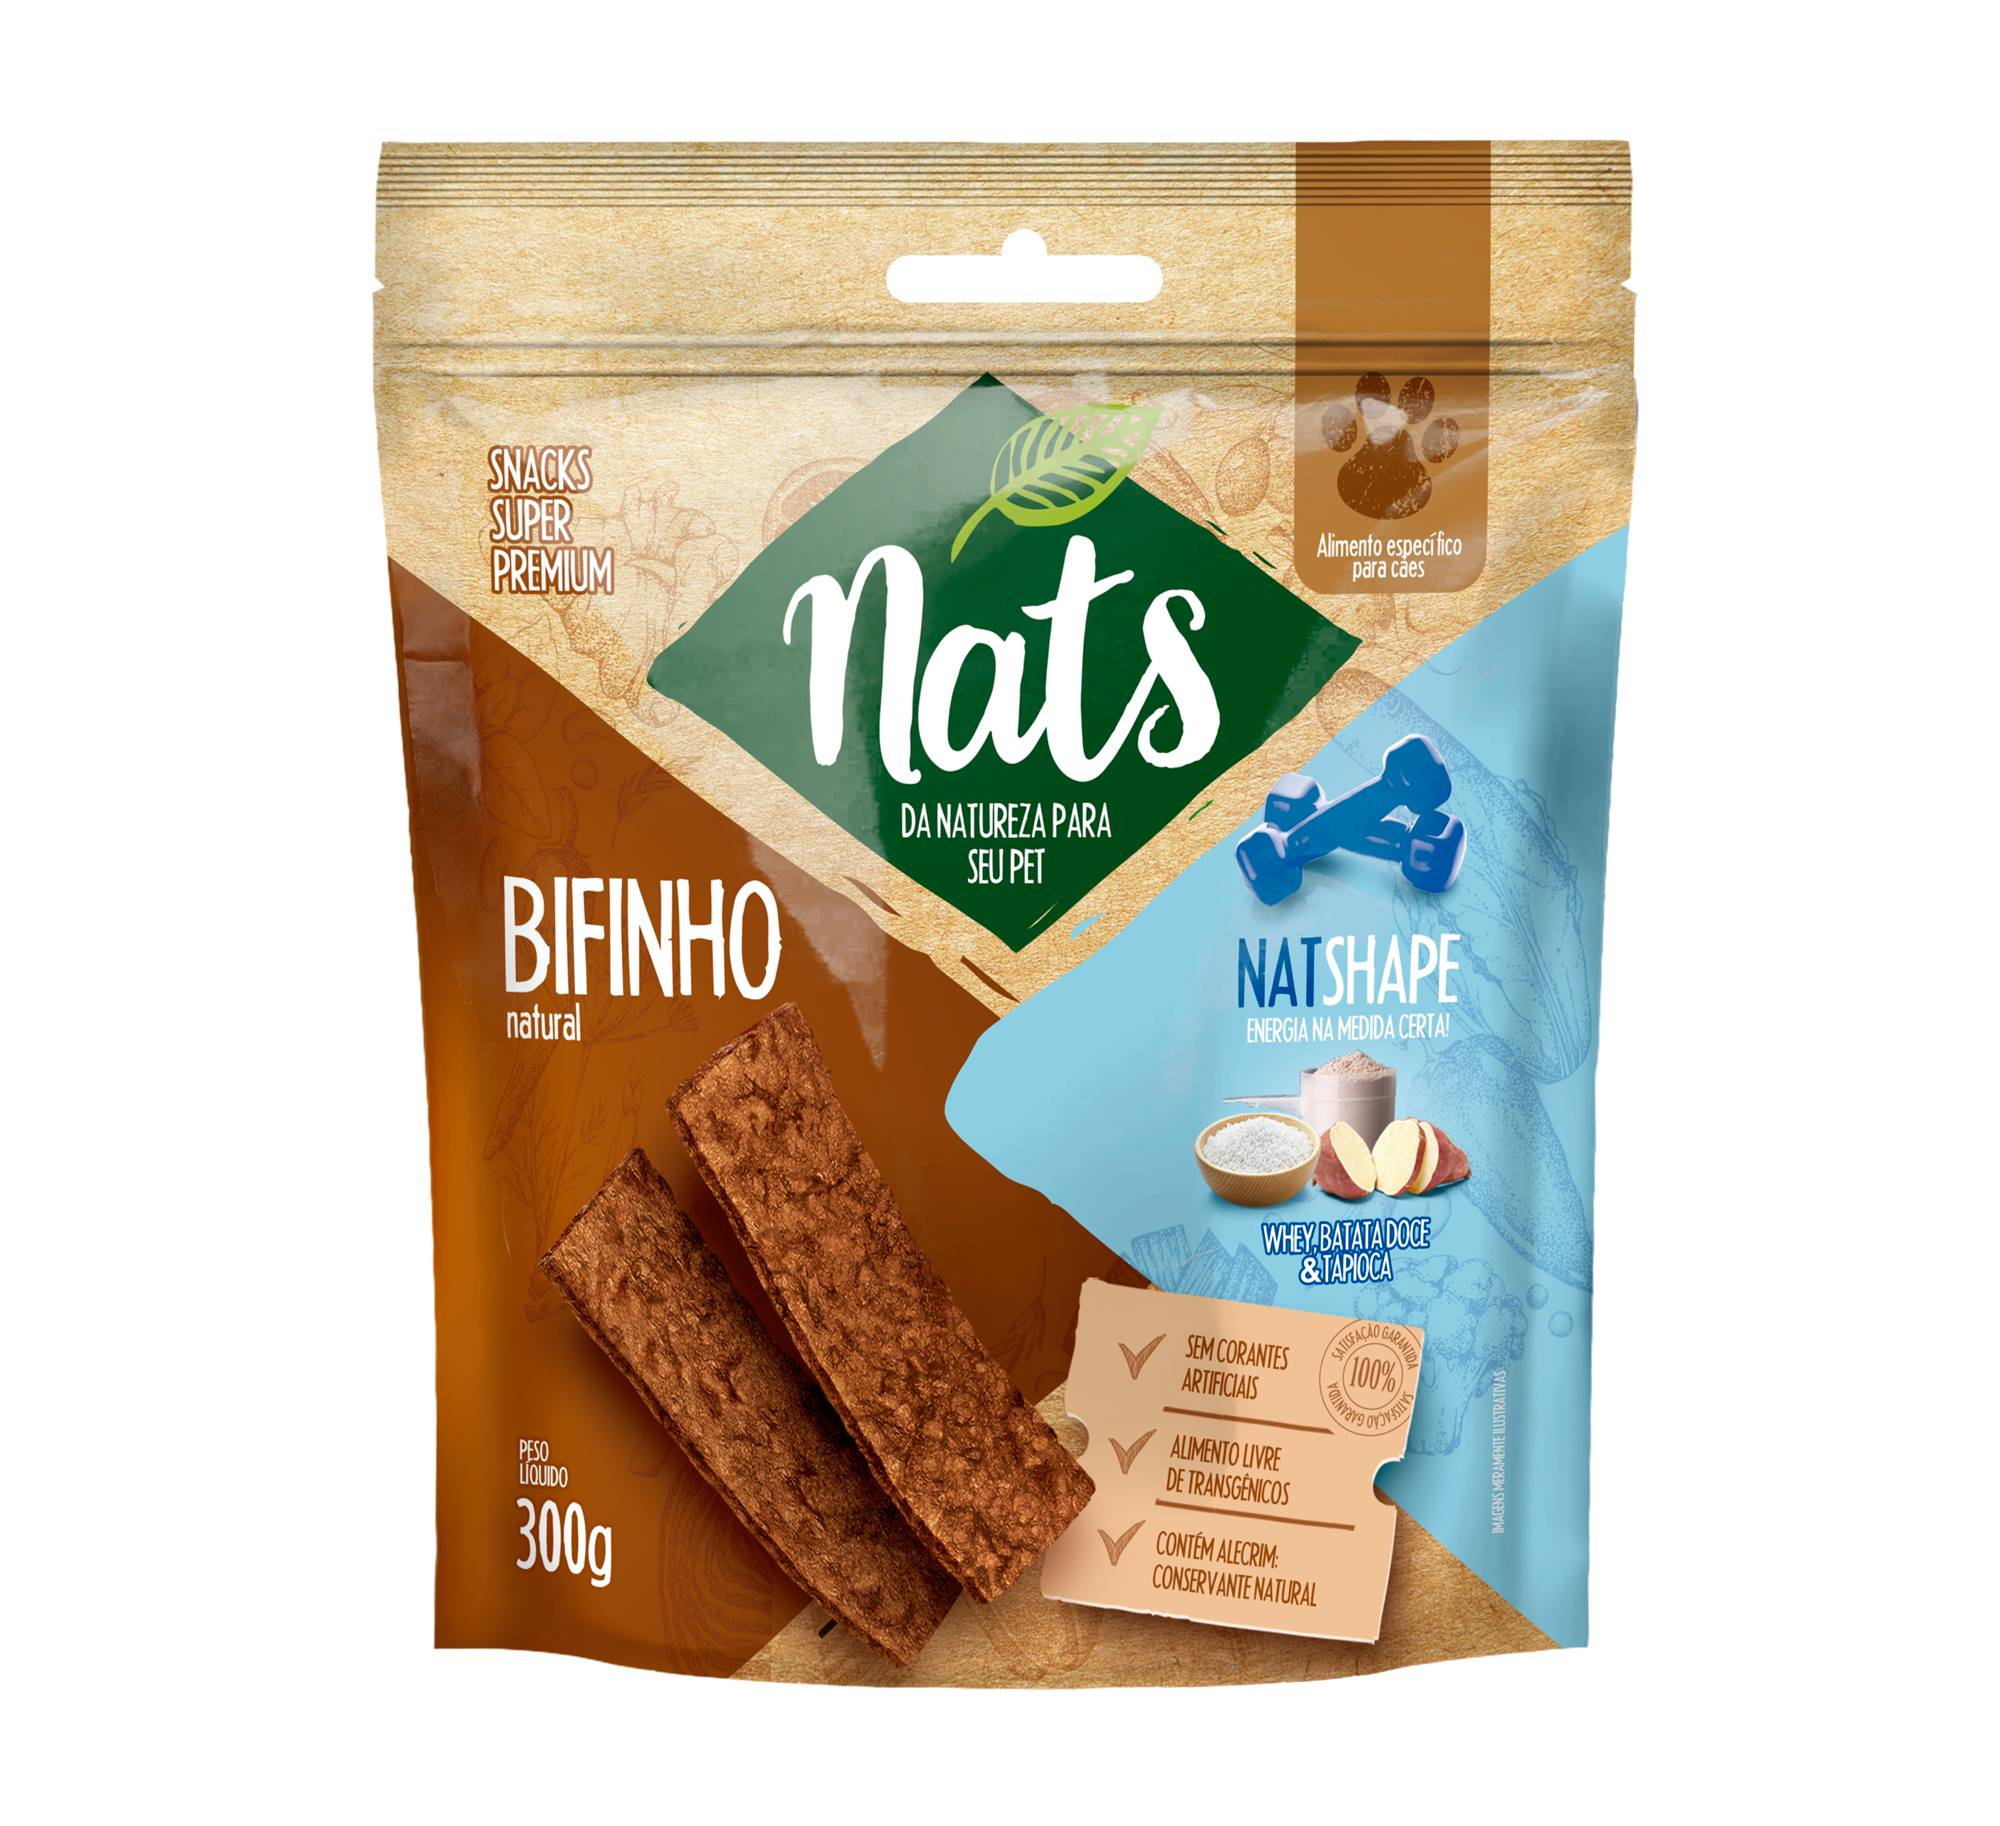 BIFINHO NATURAL PARA CÃES NATSHAPE 300G - NATS